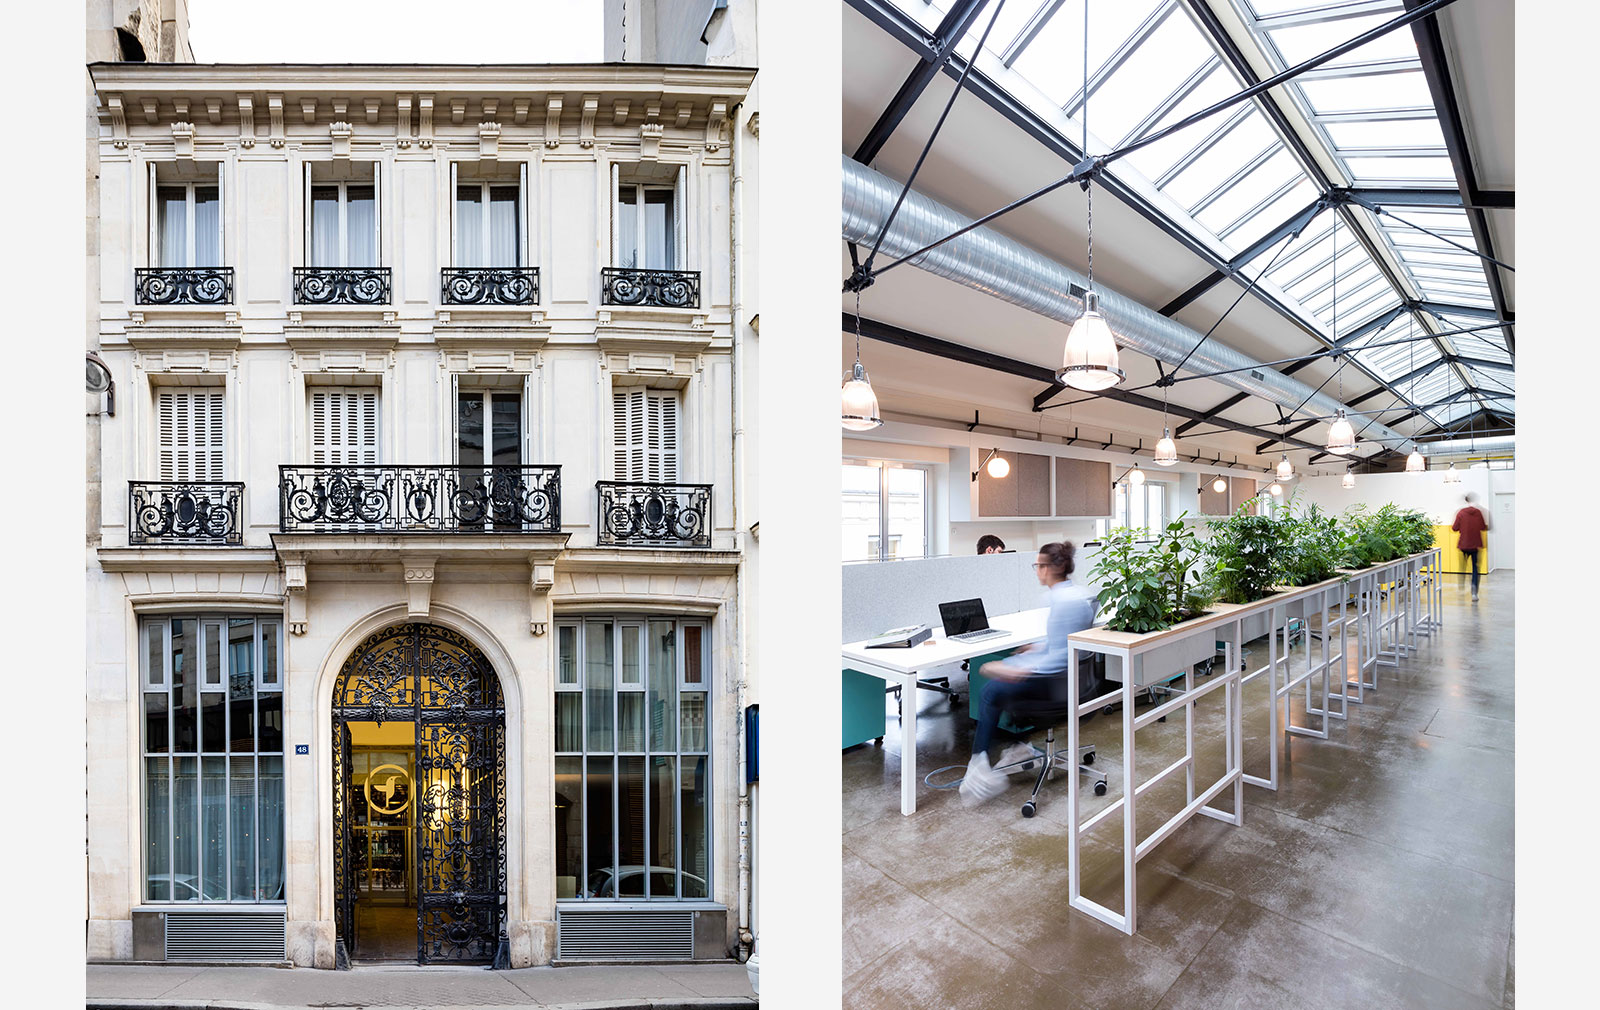 Deskopolitan coworking space in Paris, designed by MoreySmith